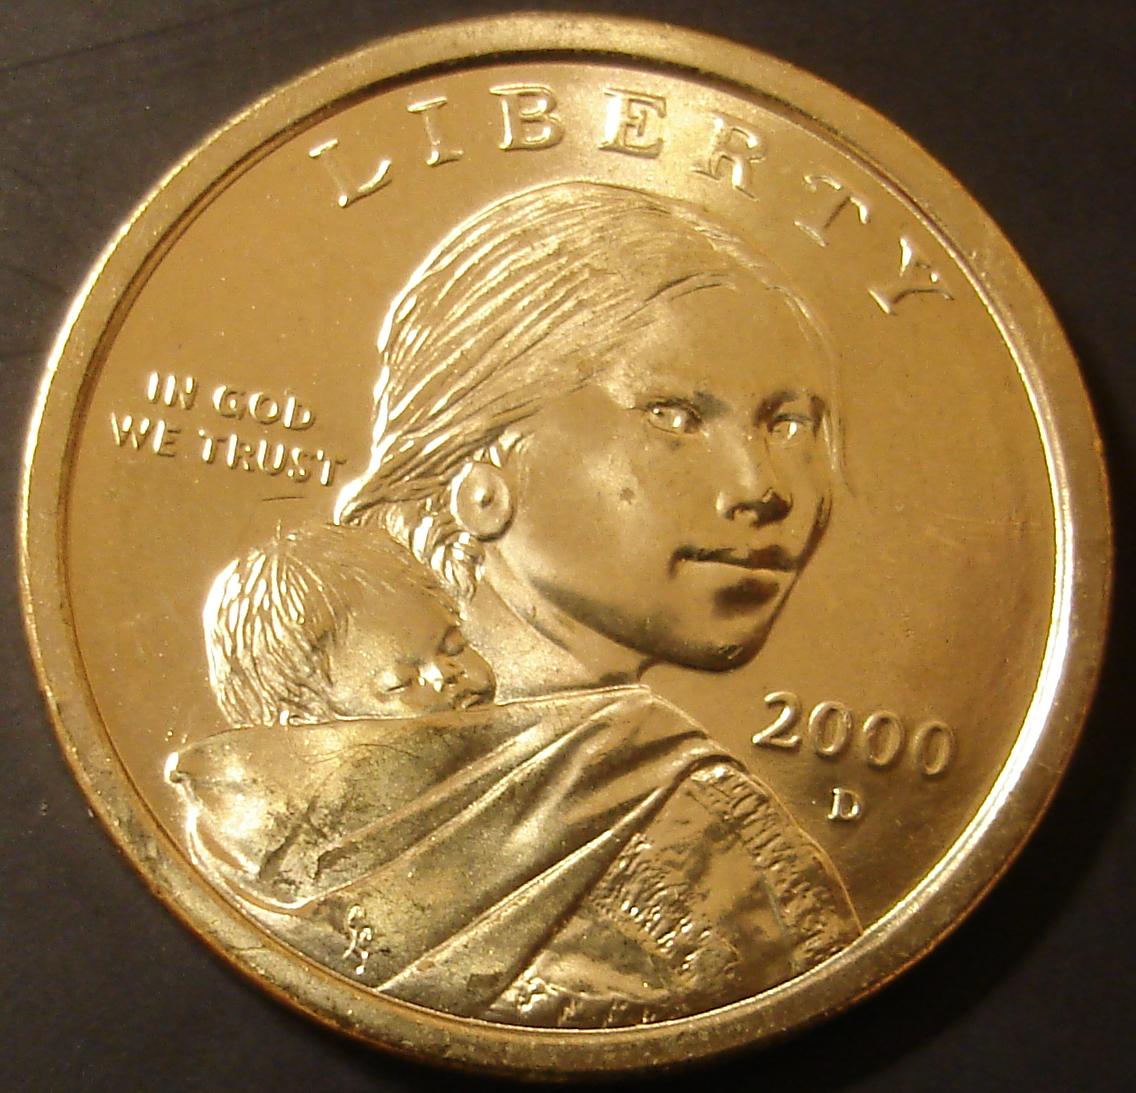 Hardwood Floors Versus Laminate 2000 Dollar Coin 28 Images 2000 Gold Dollar Coin